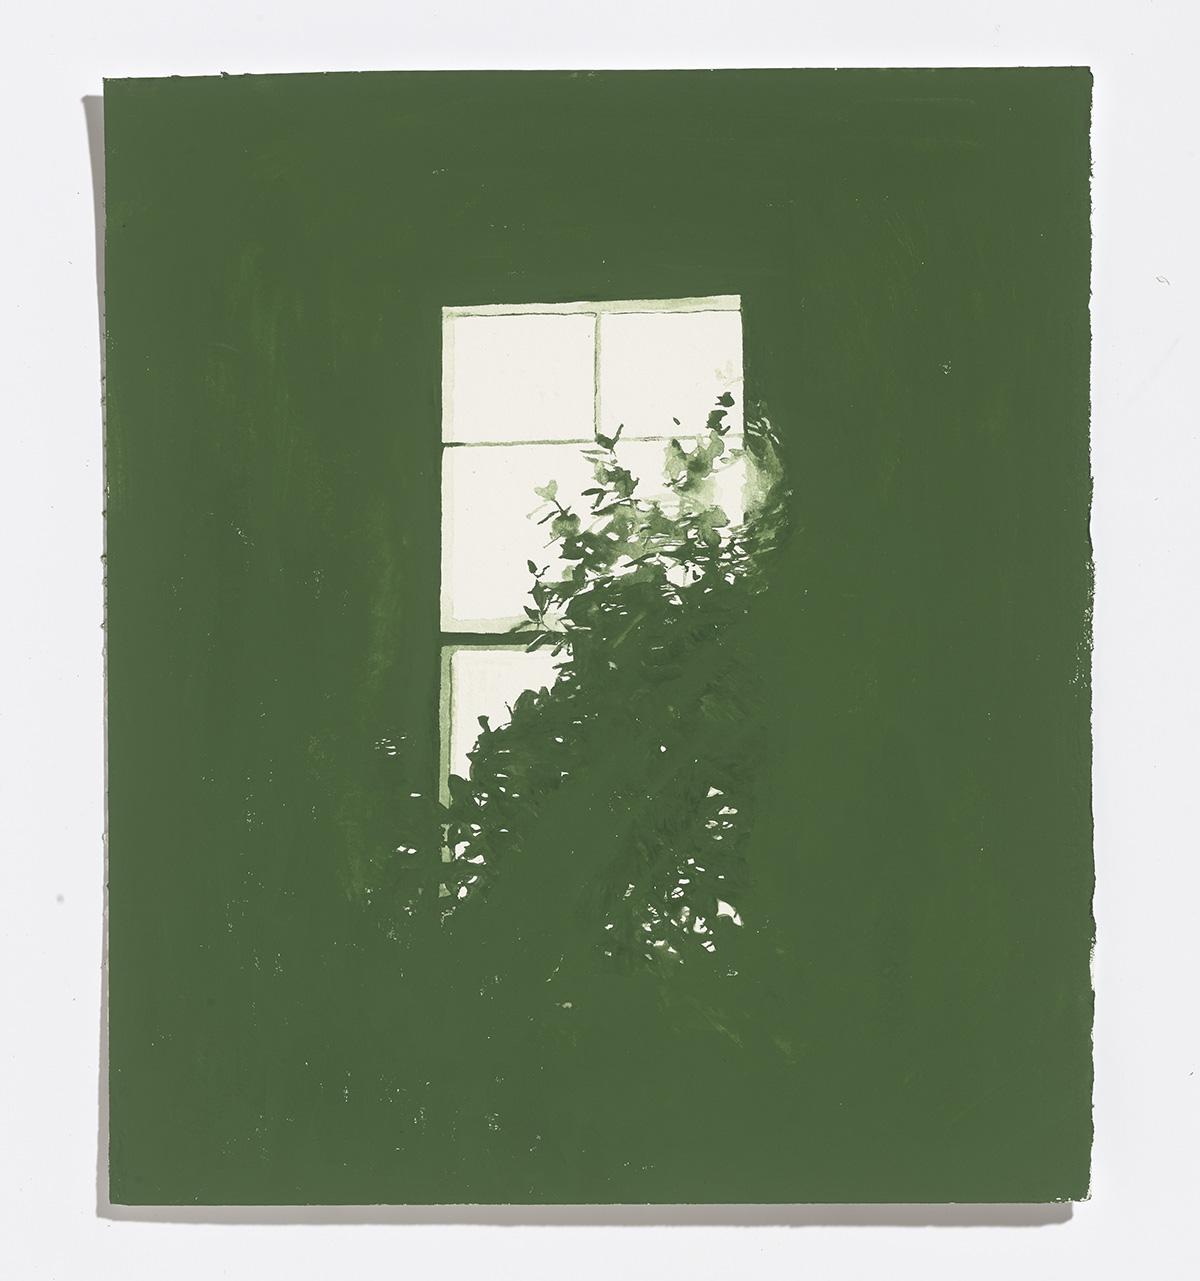 Green Window, 2017,watercolour on paper, 10.25 x 9 in